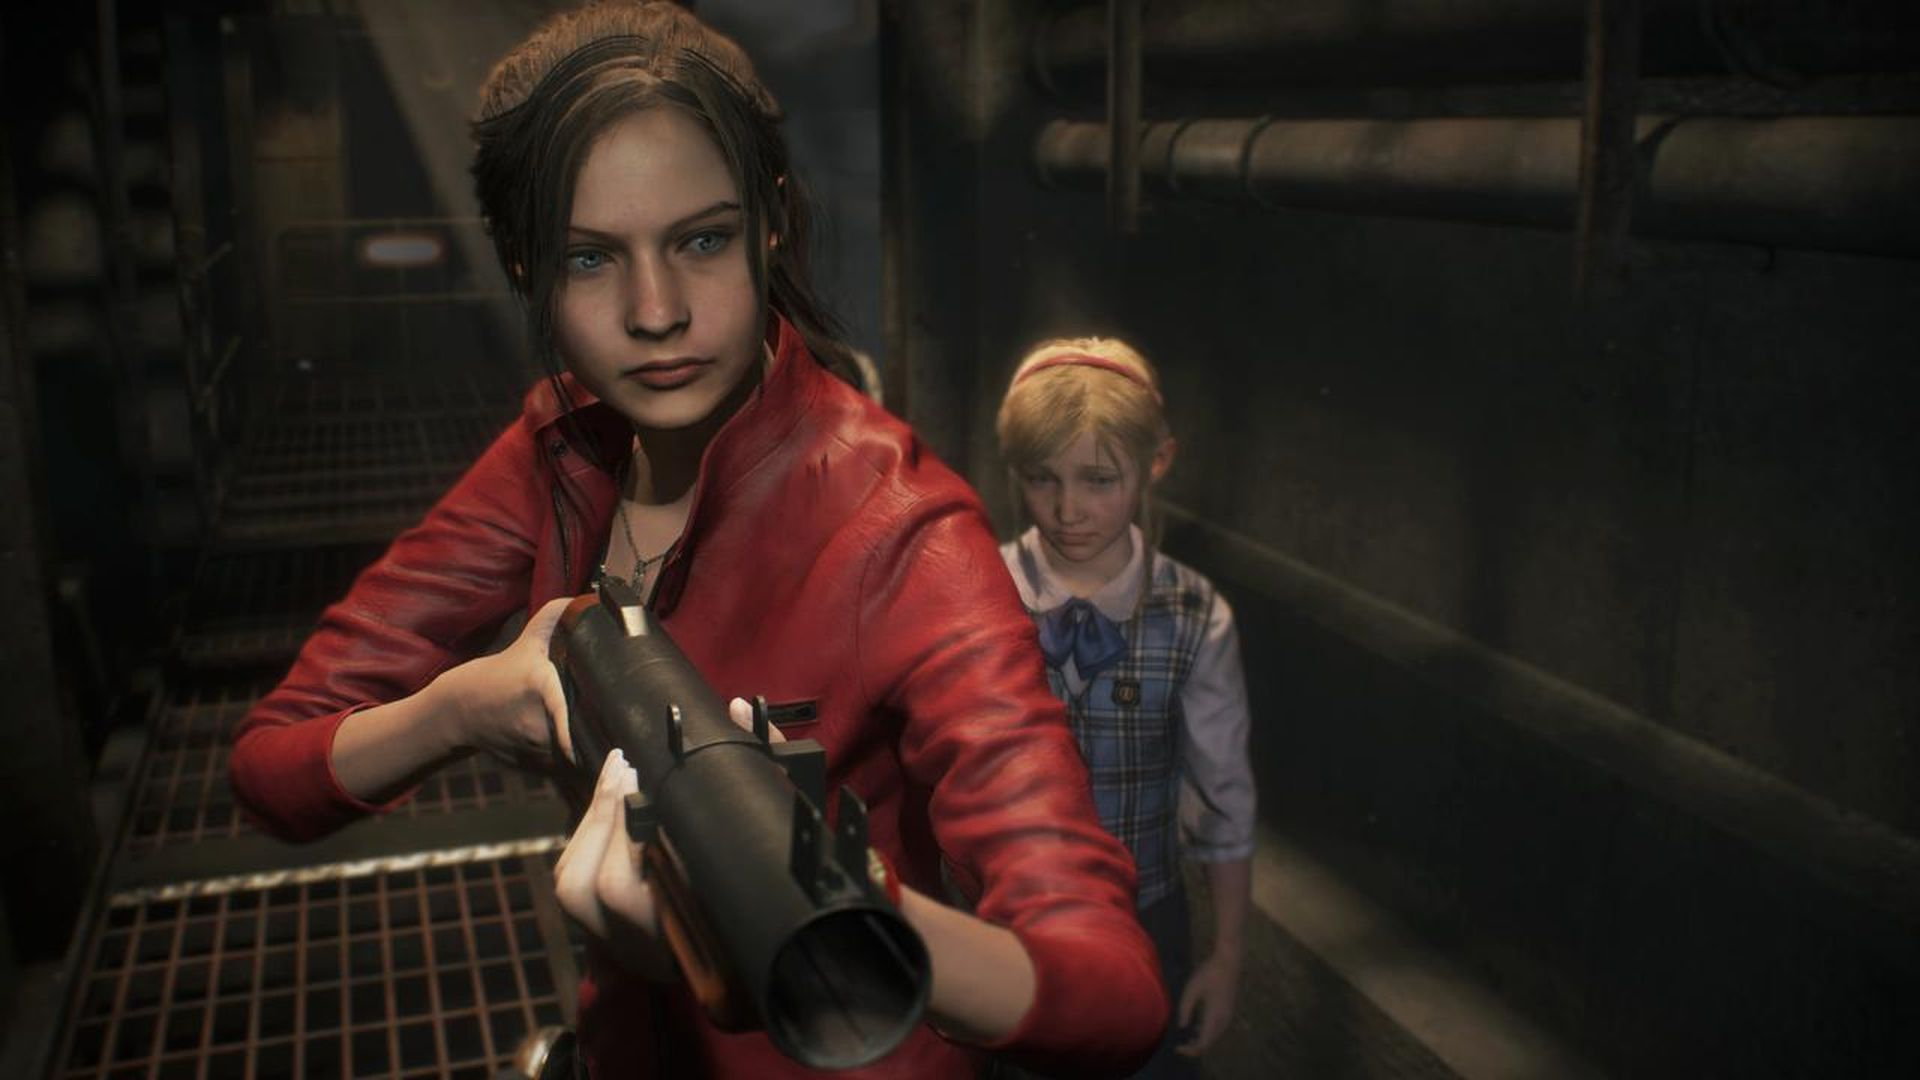 Resident Evil 2 has already sold three million copies